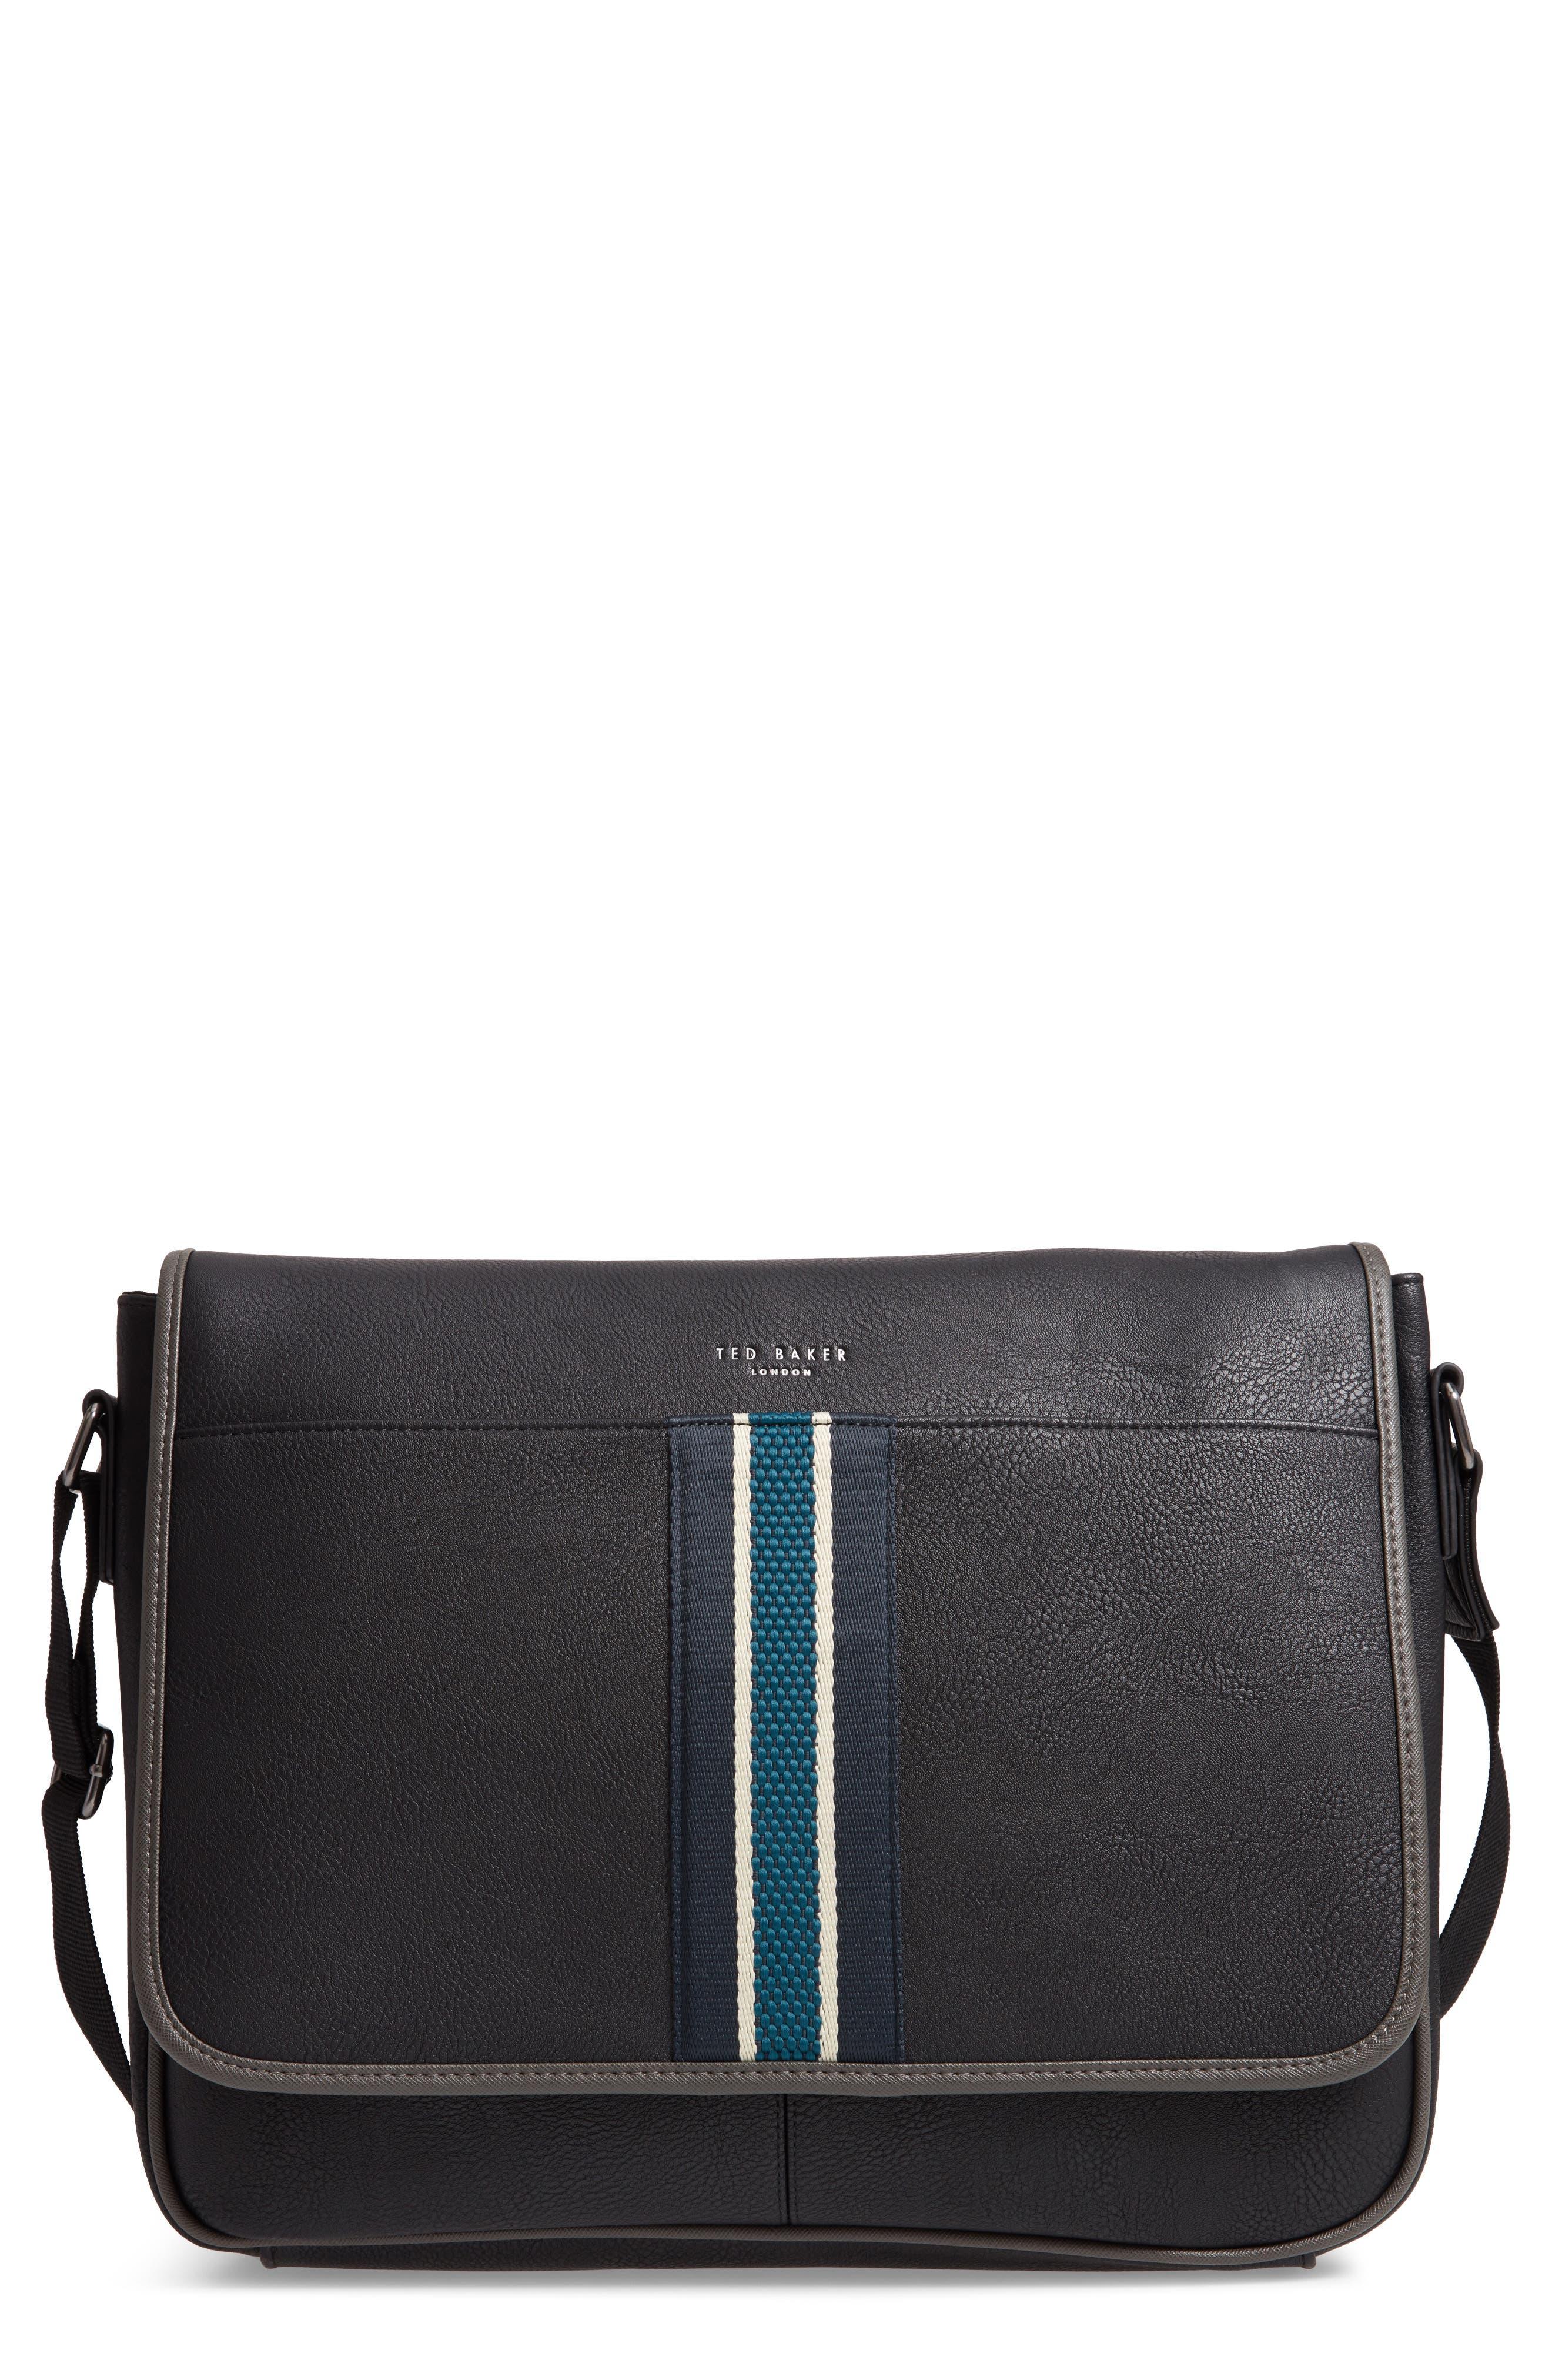 Kingcol Faux Leather Messenger Bag,                         Main,                         color, Black